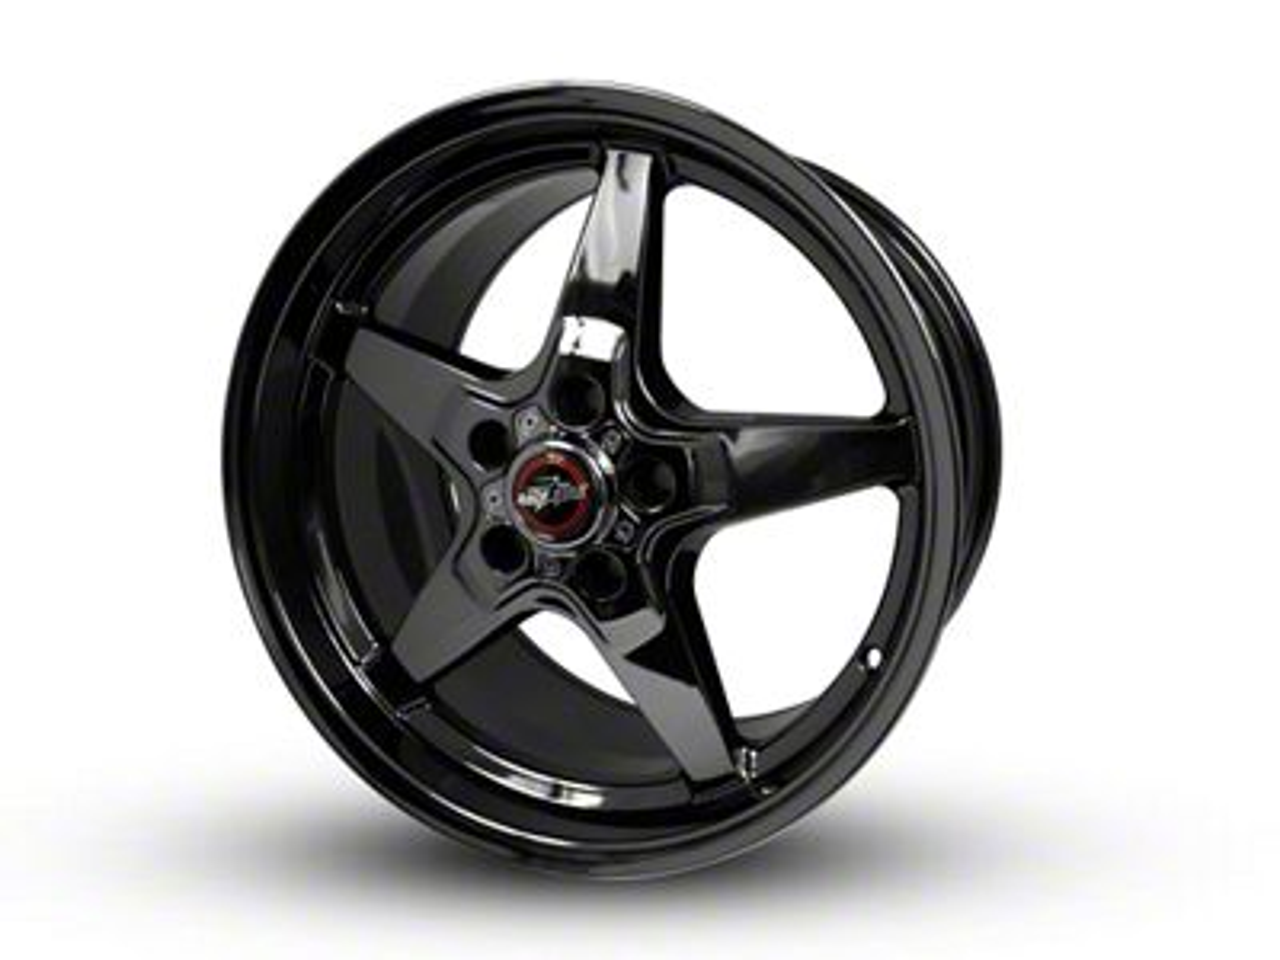 Race Star Dark Star Drag Wheel - 18x10.5 (15-19 GT, EcoBoost, V6)